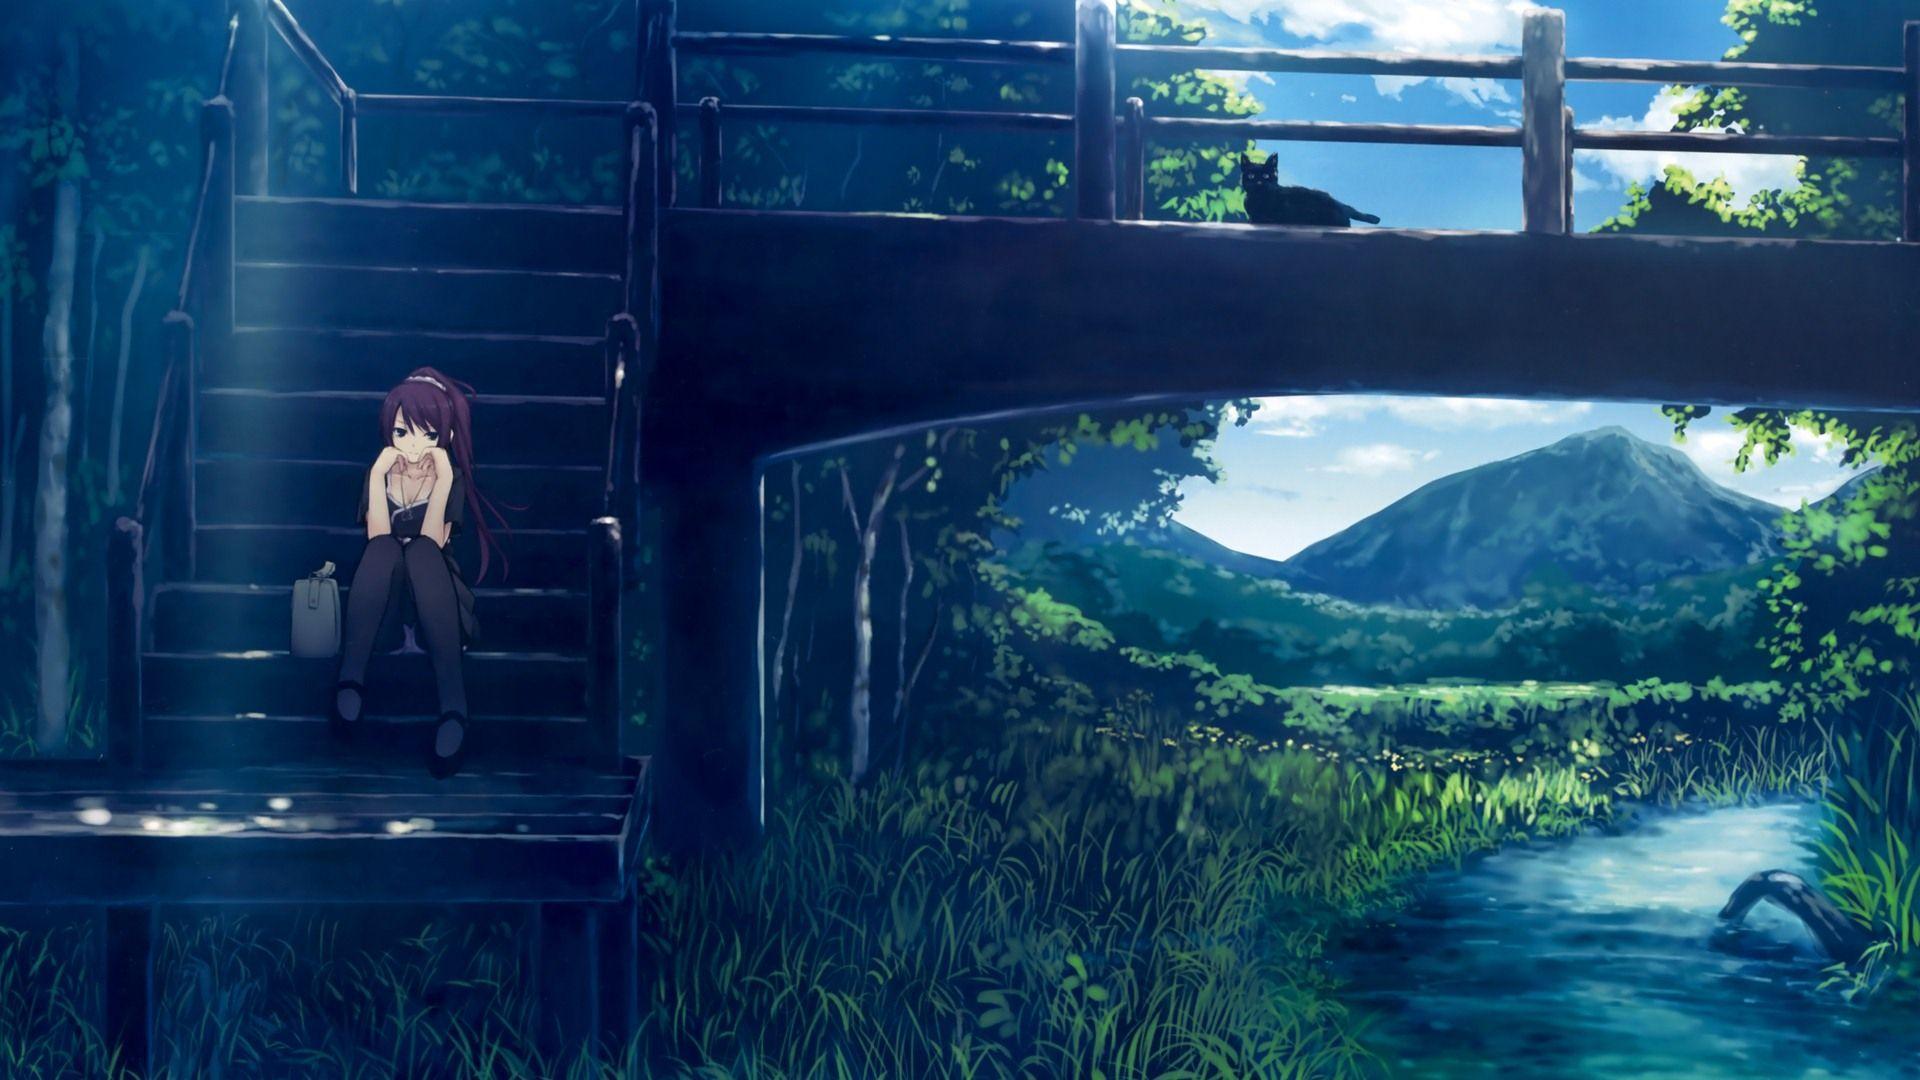 Sad Anime Wallpapers - Wallpaper Cave